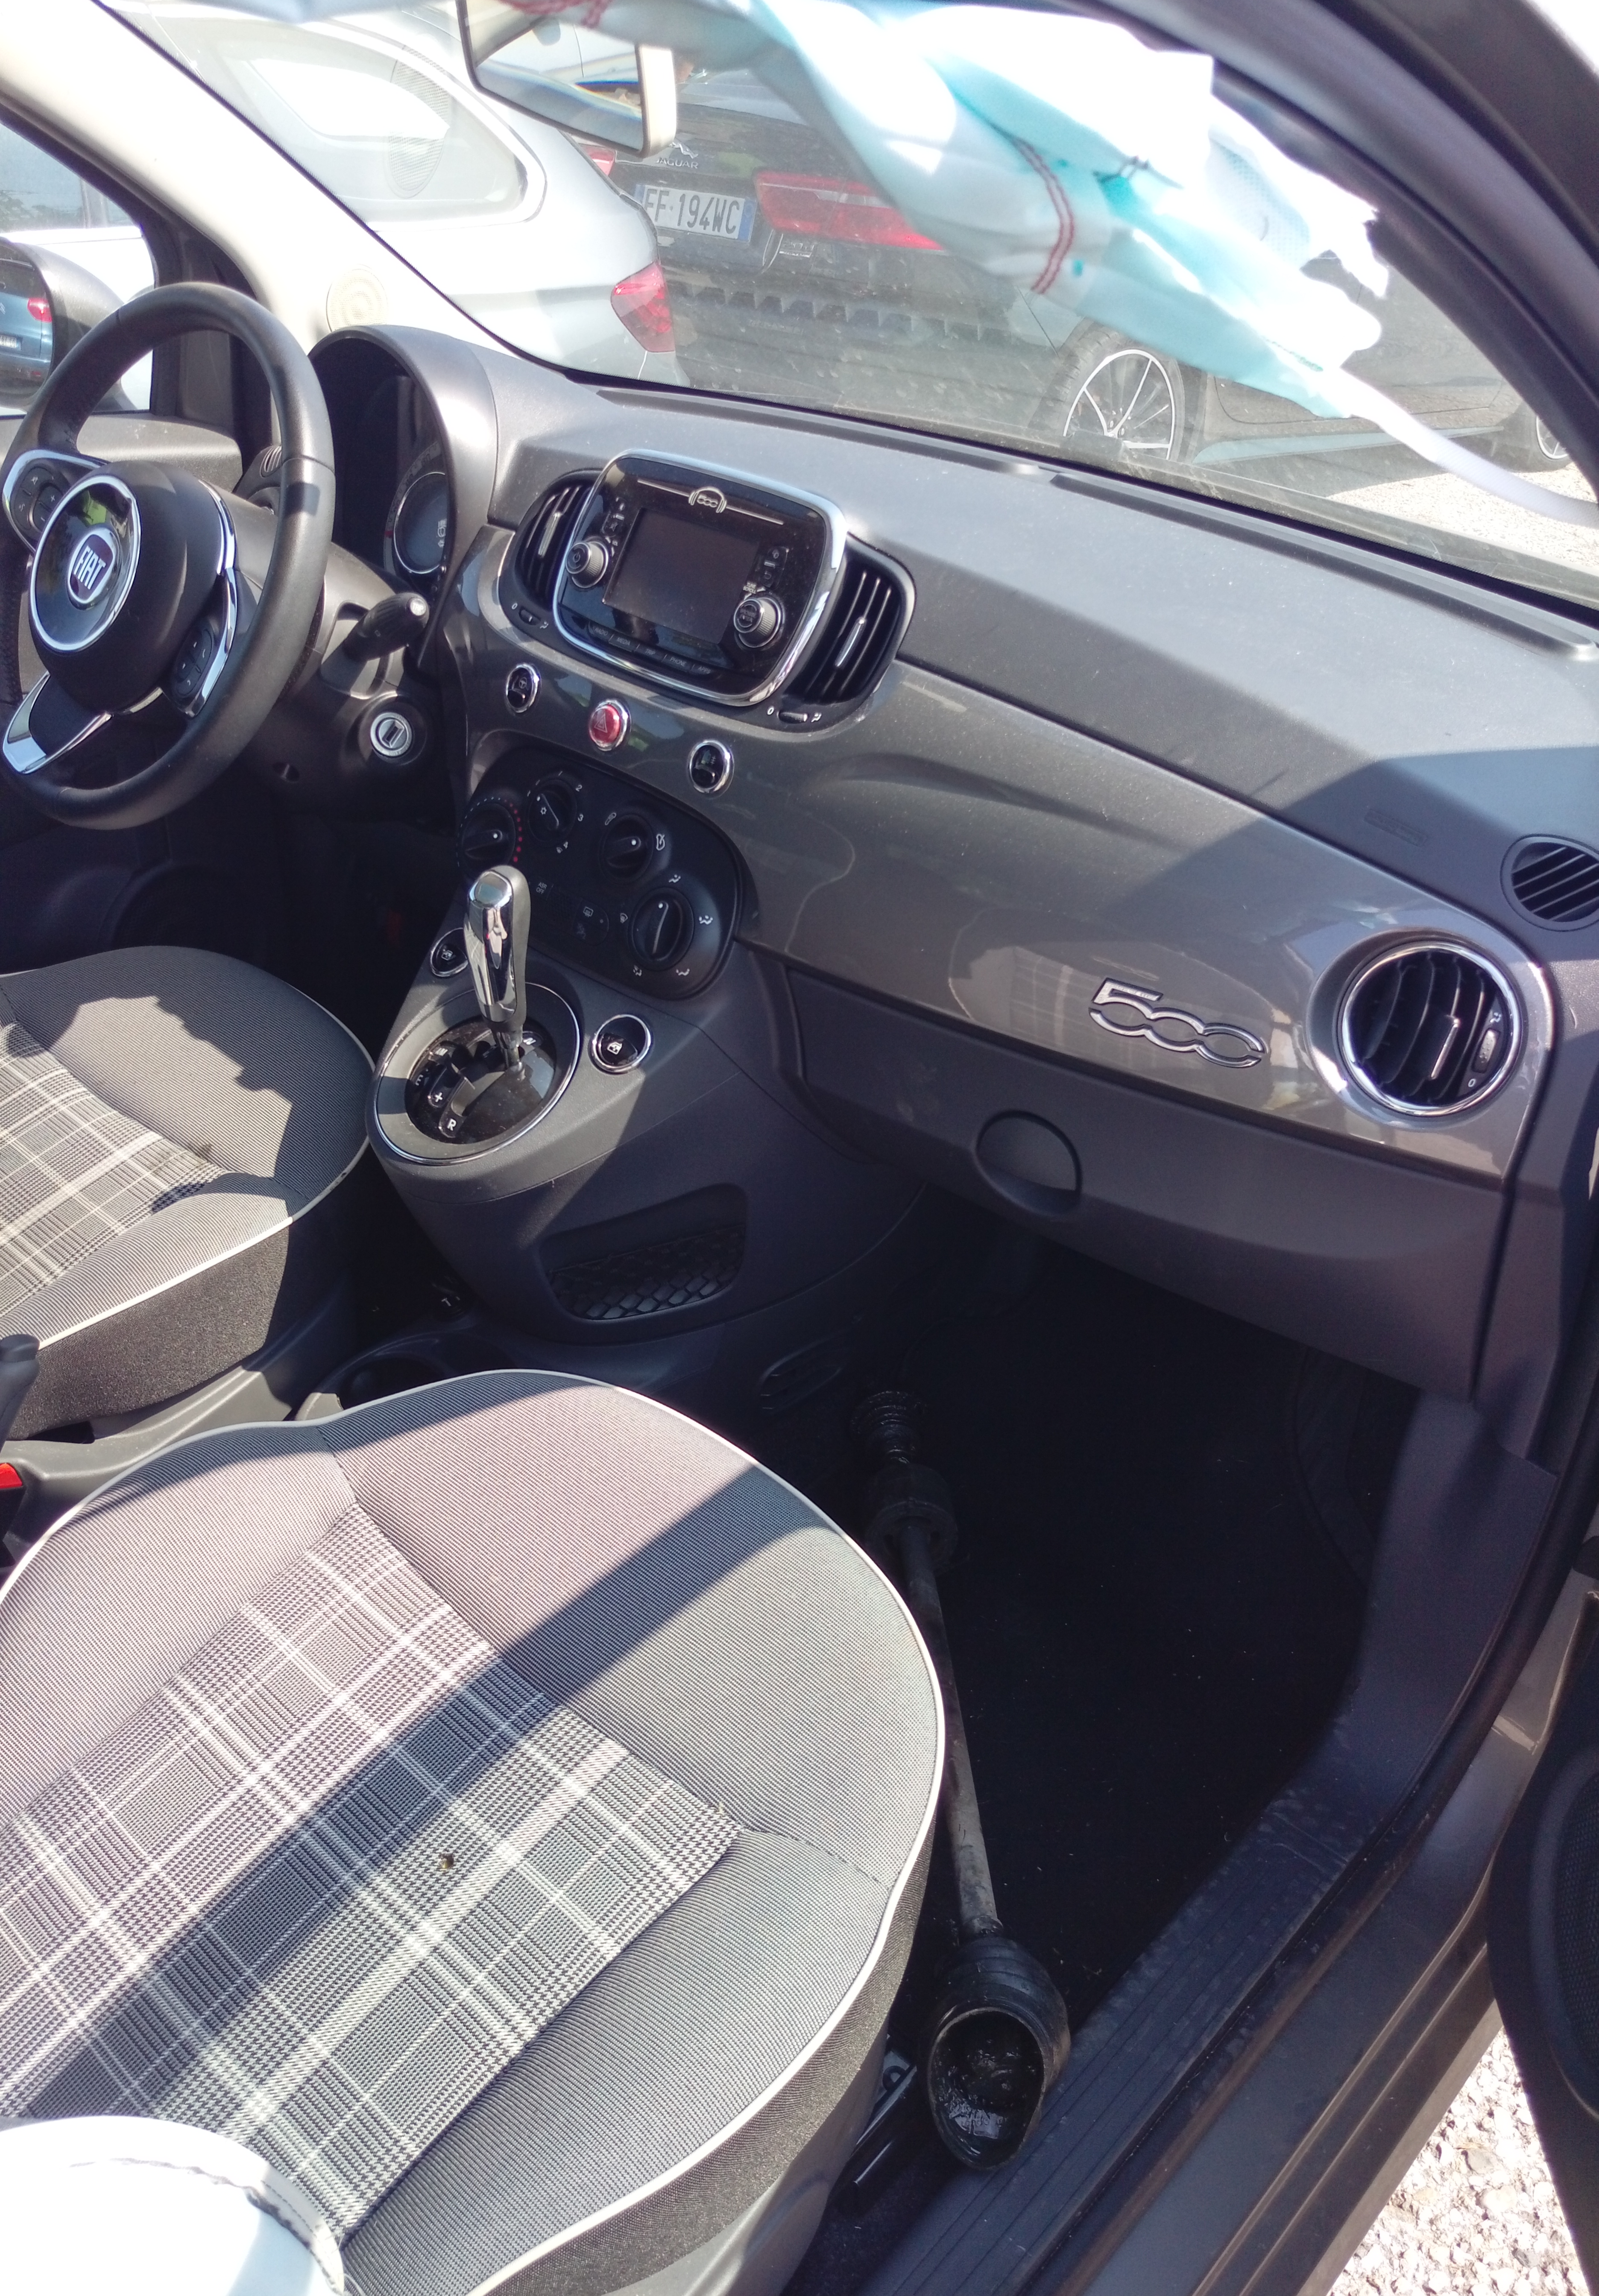 Fiat 500 1.2 benzina Lounge 70cv anno 03-2017